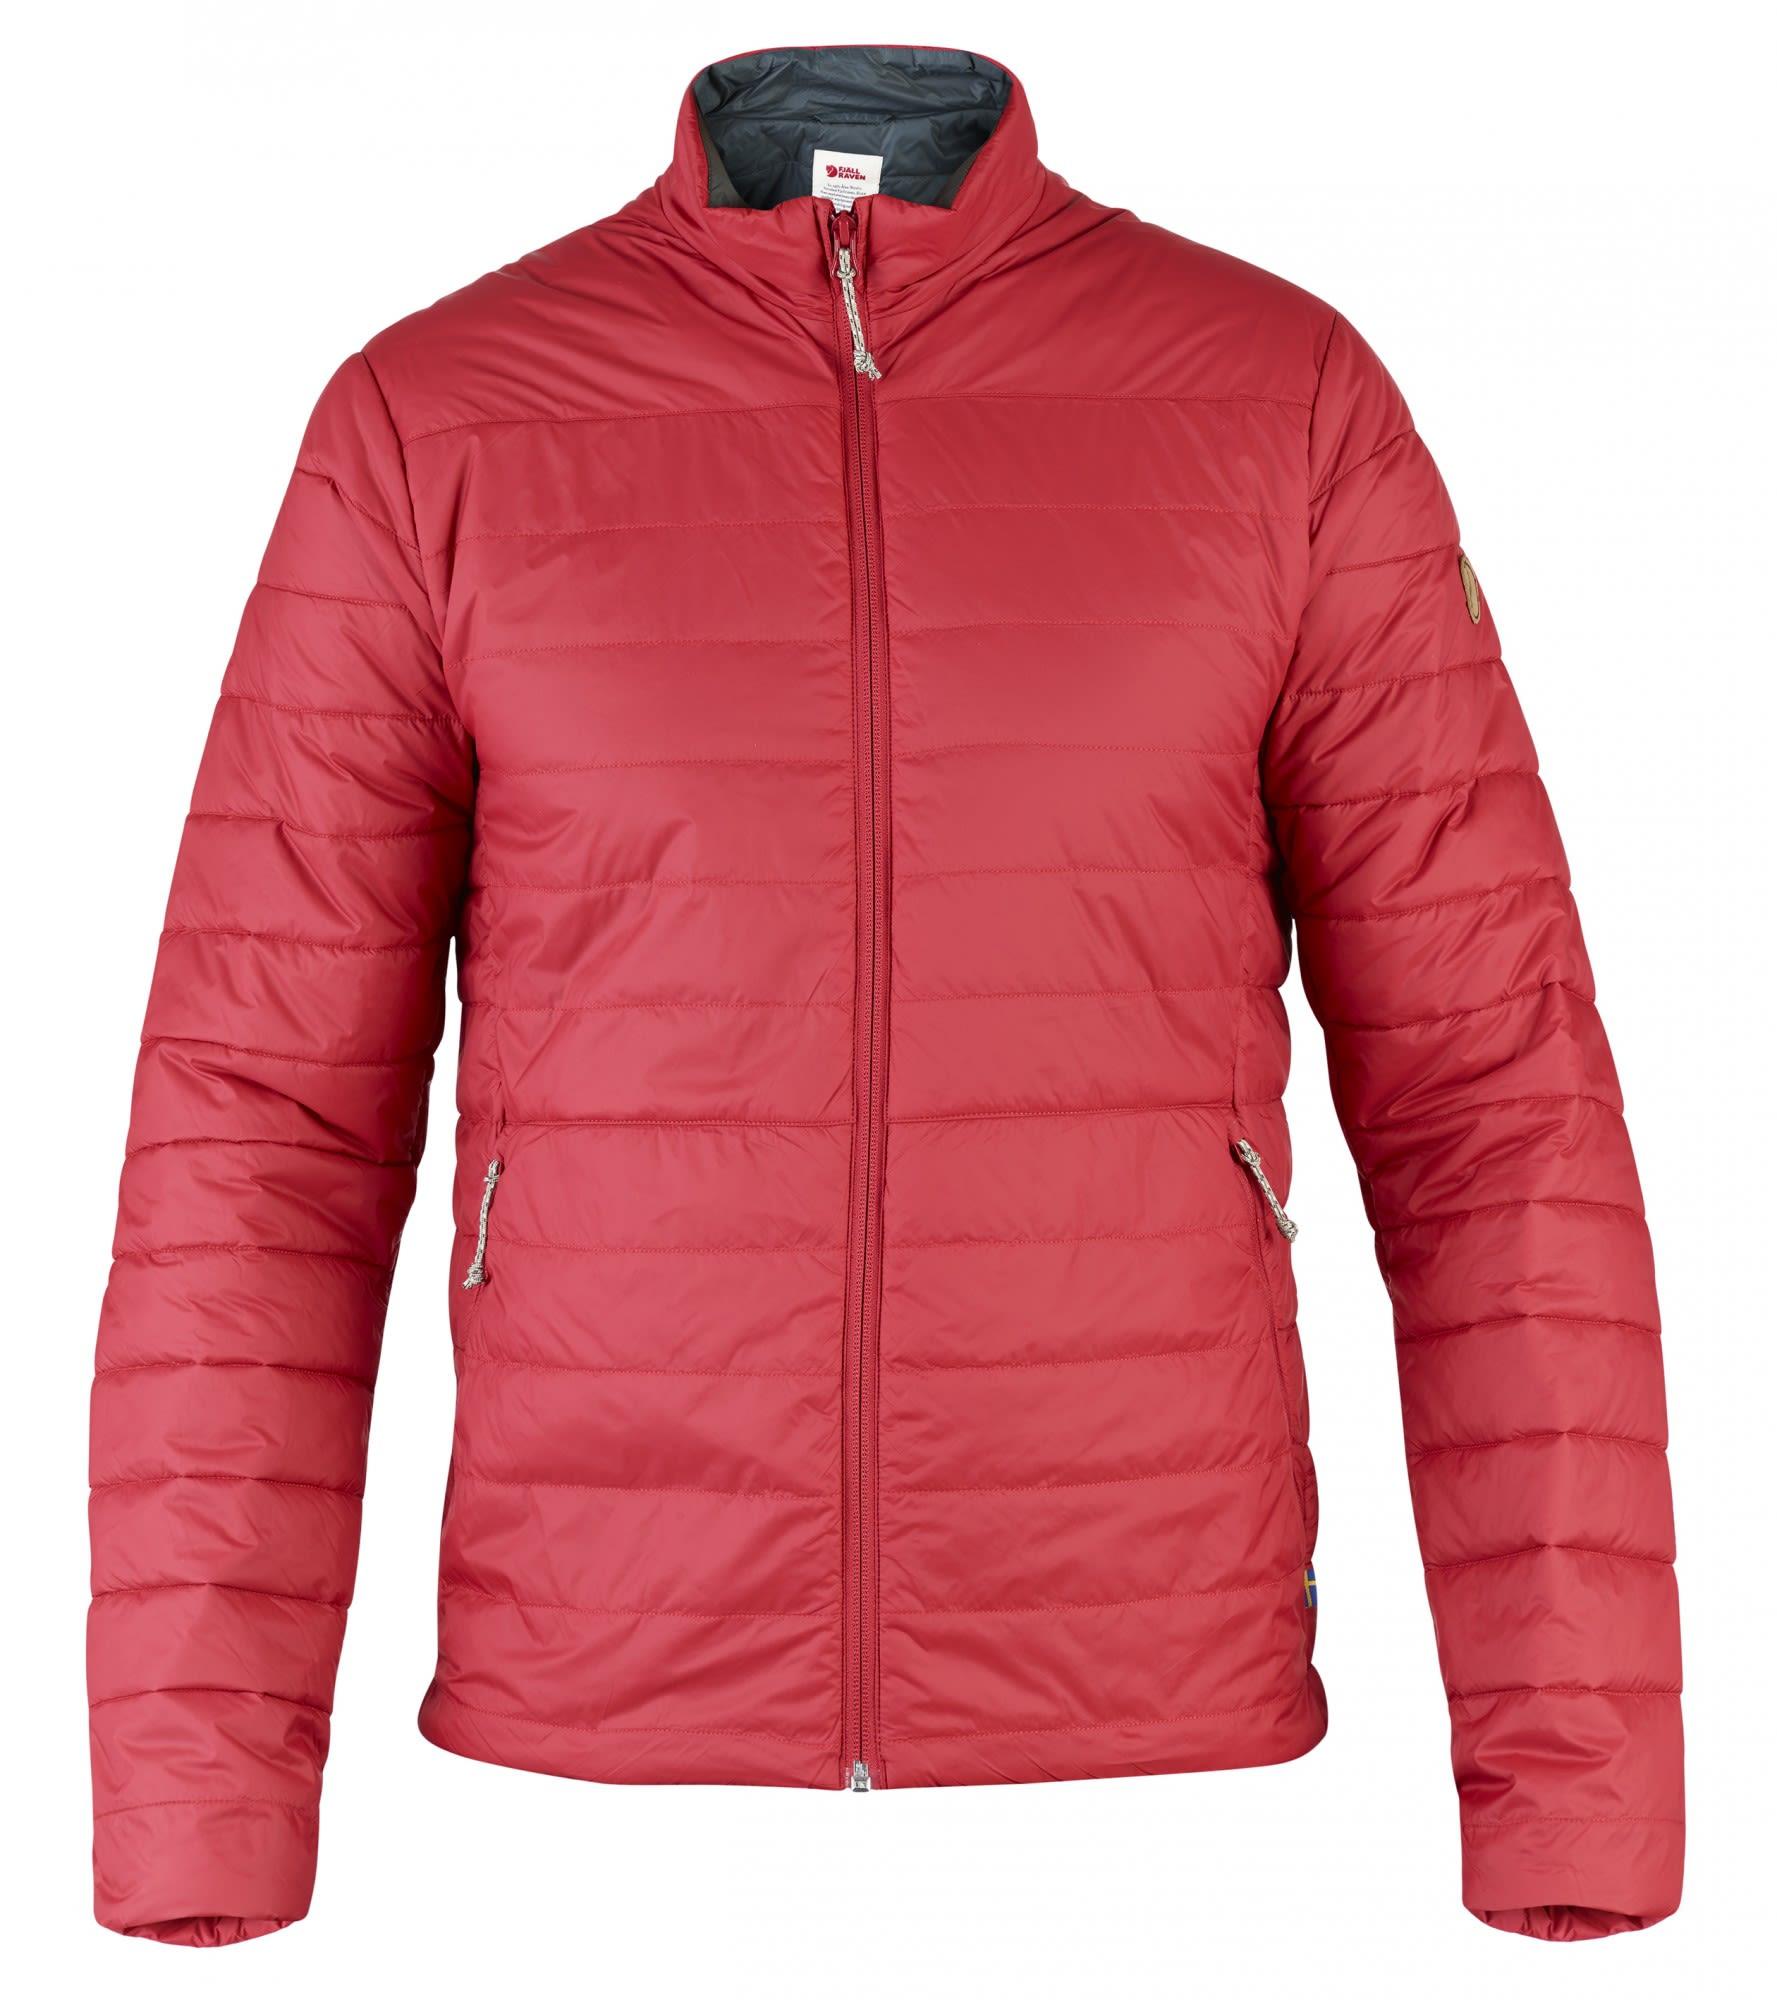 Fjällräven M Keb Lite Padded Jacket | Größe XS,S,M,L,XL,XXL,3XL | Herren Iso